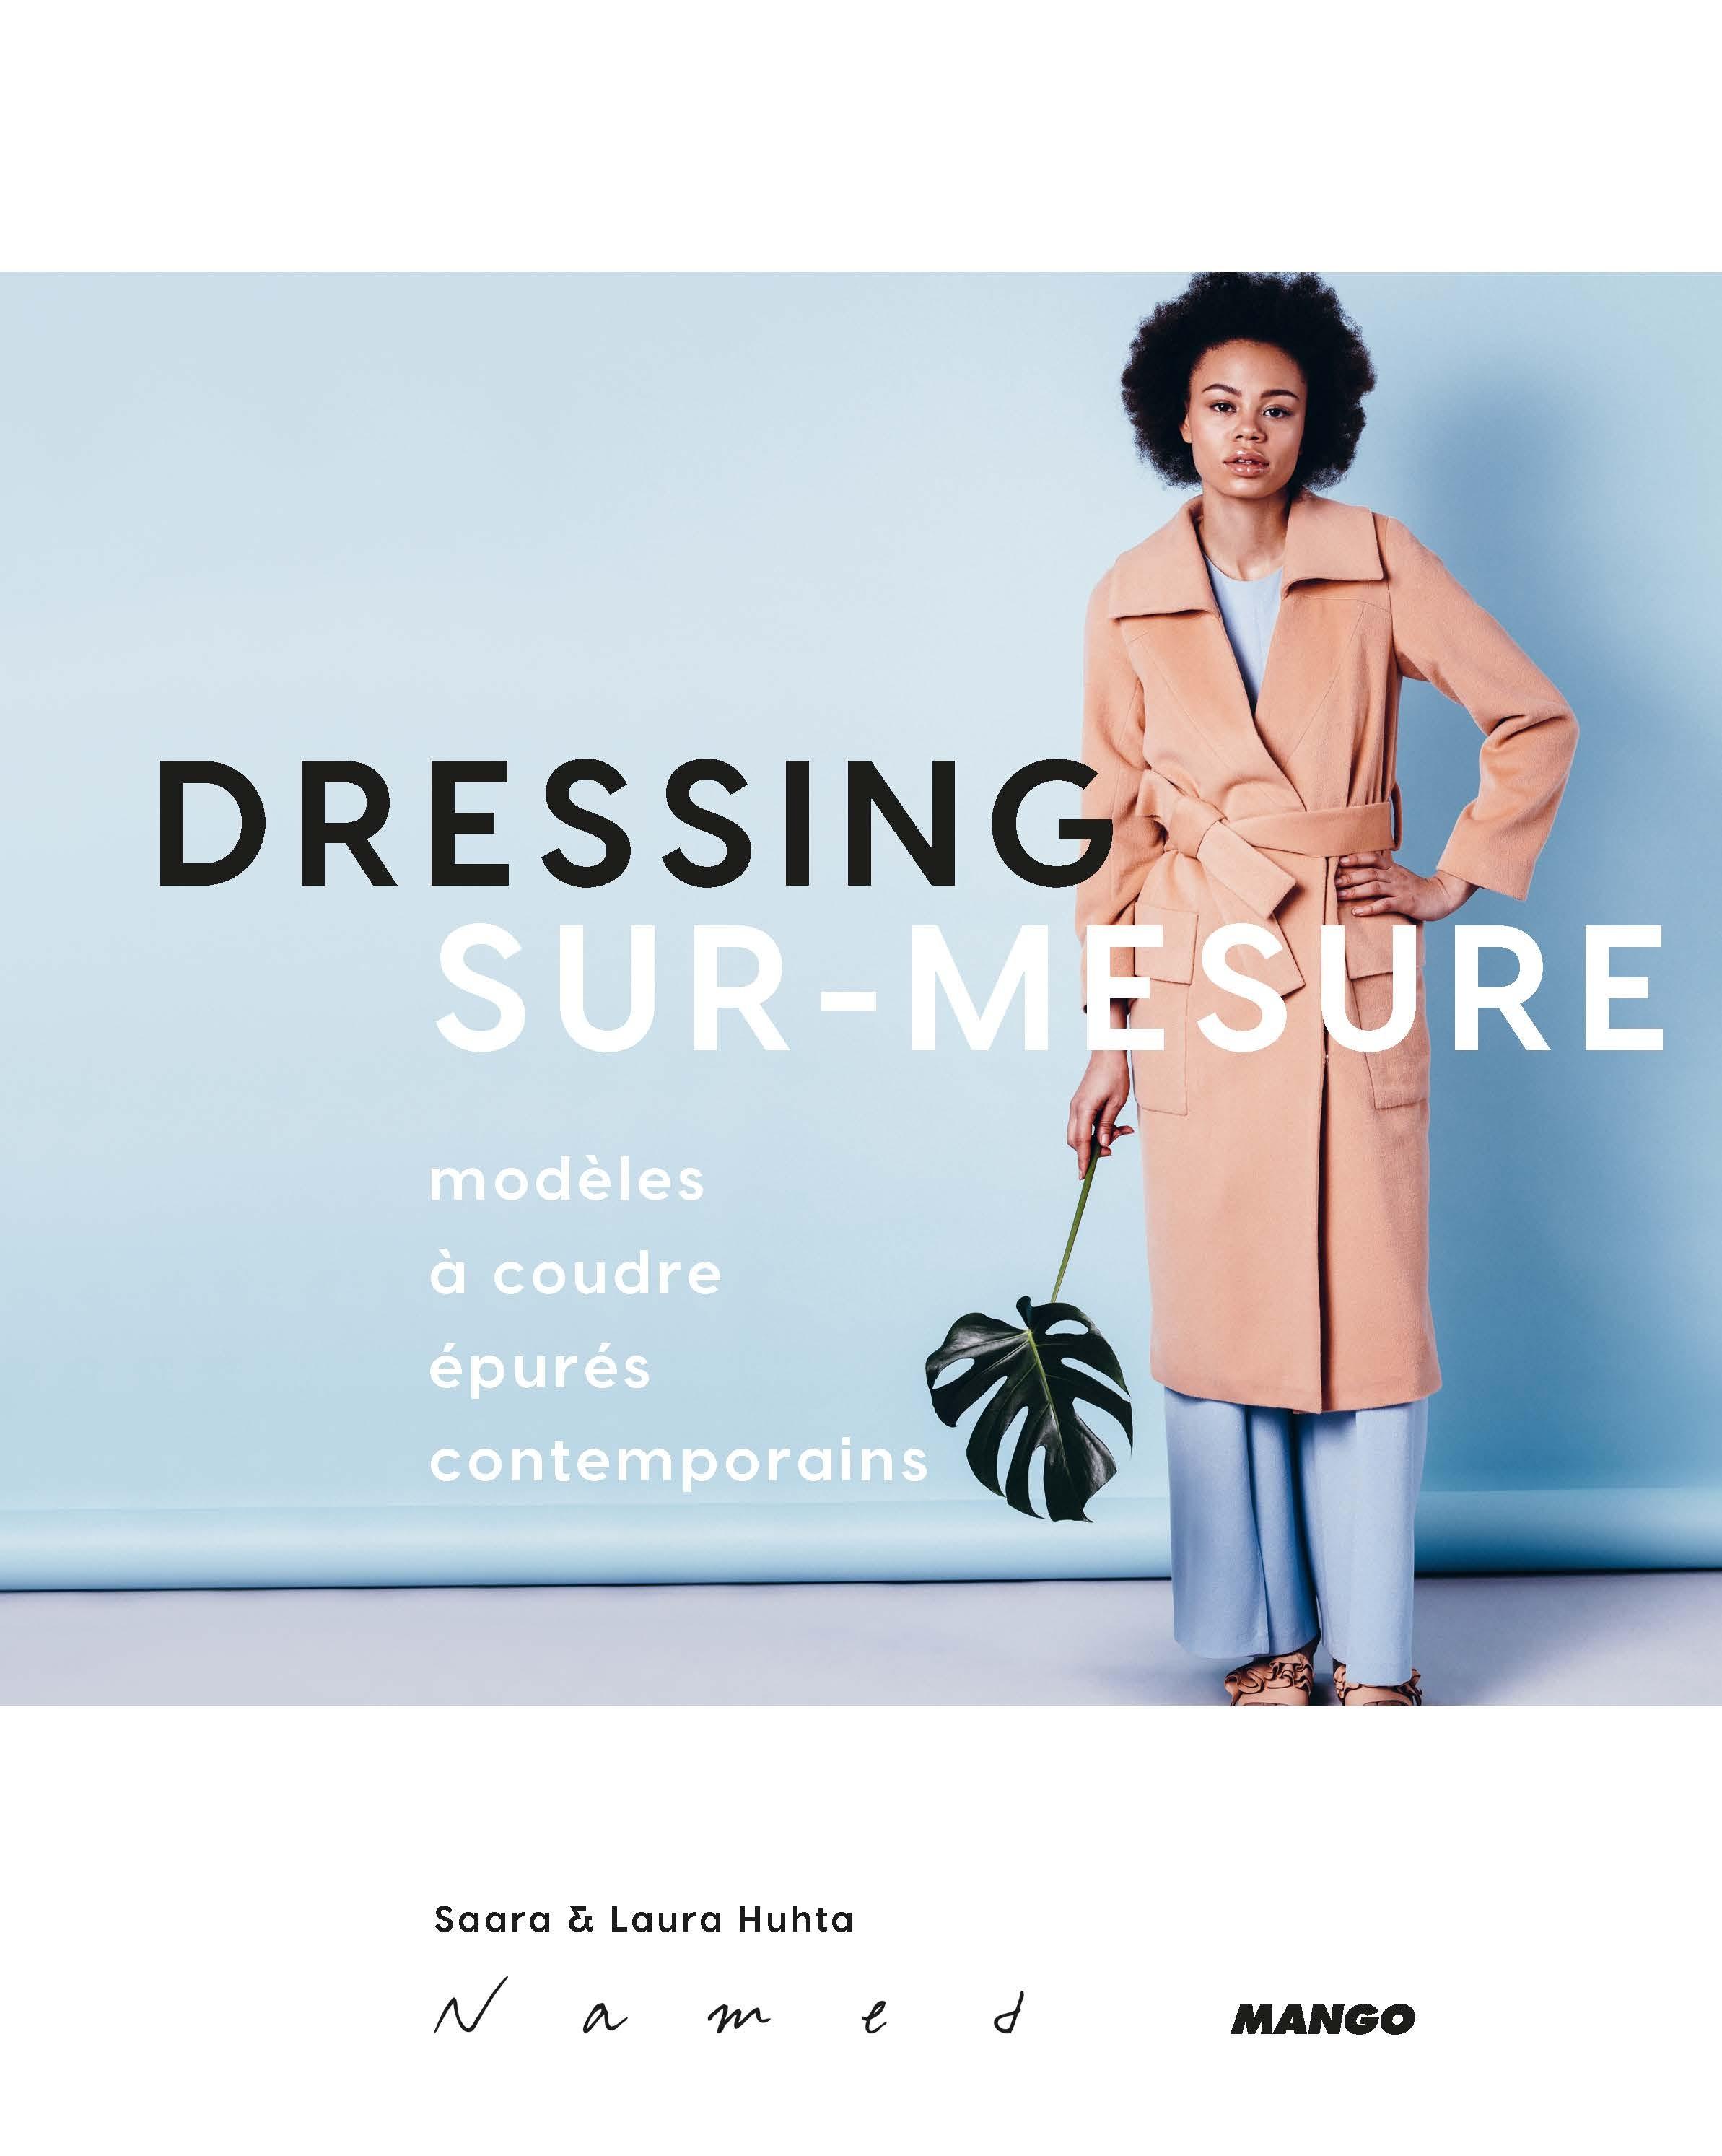 DRESSING SUR-MESURE